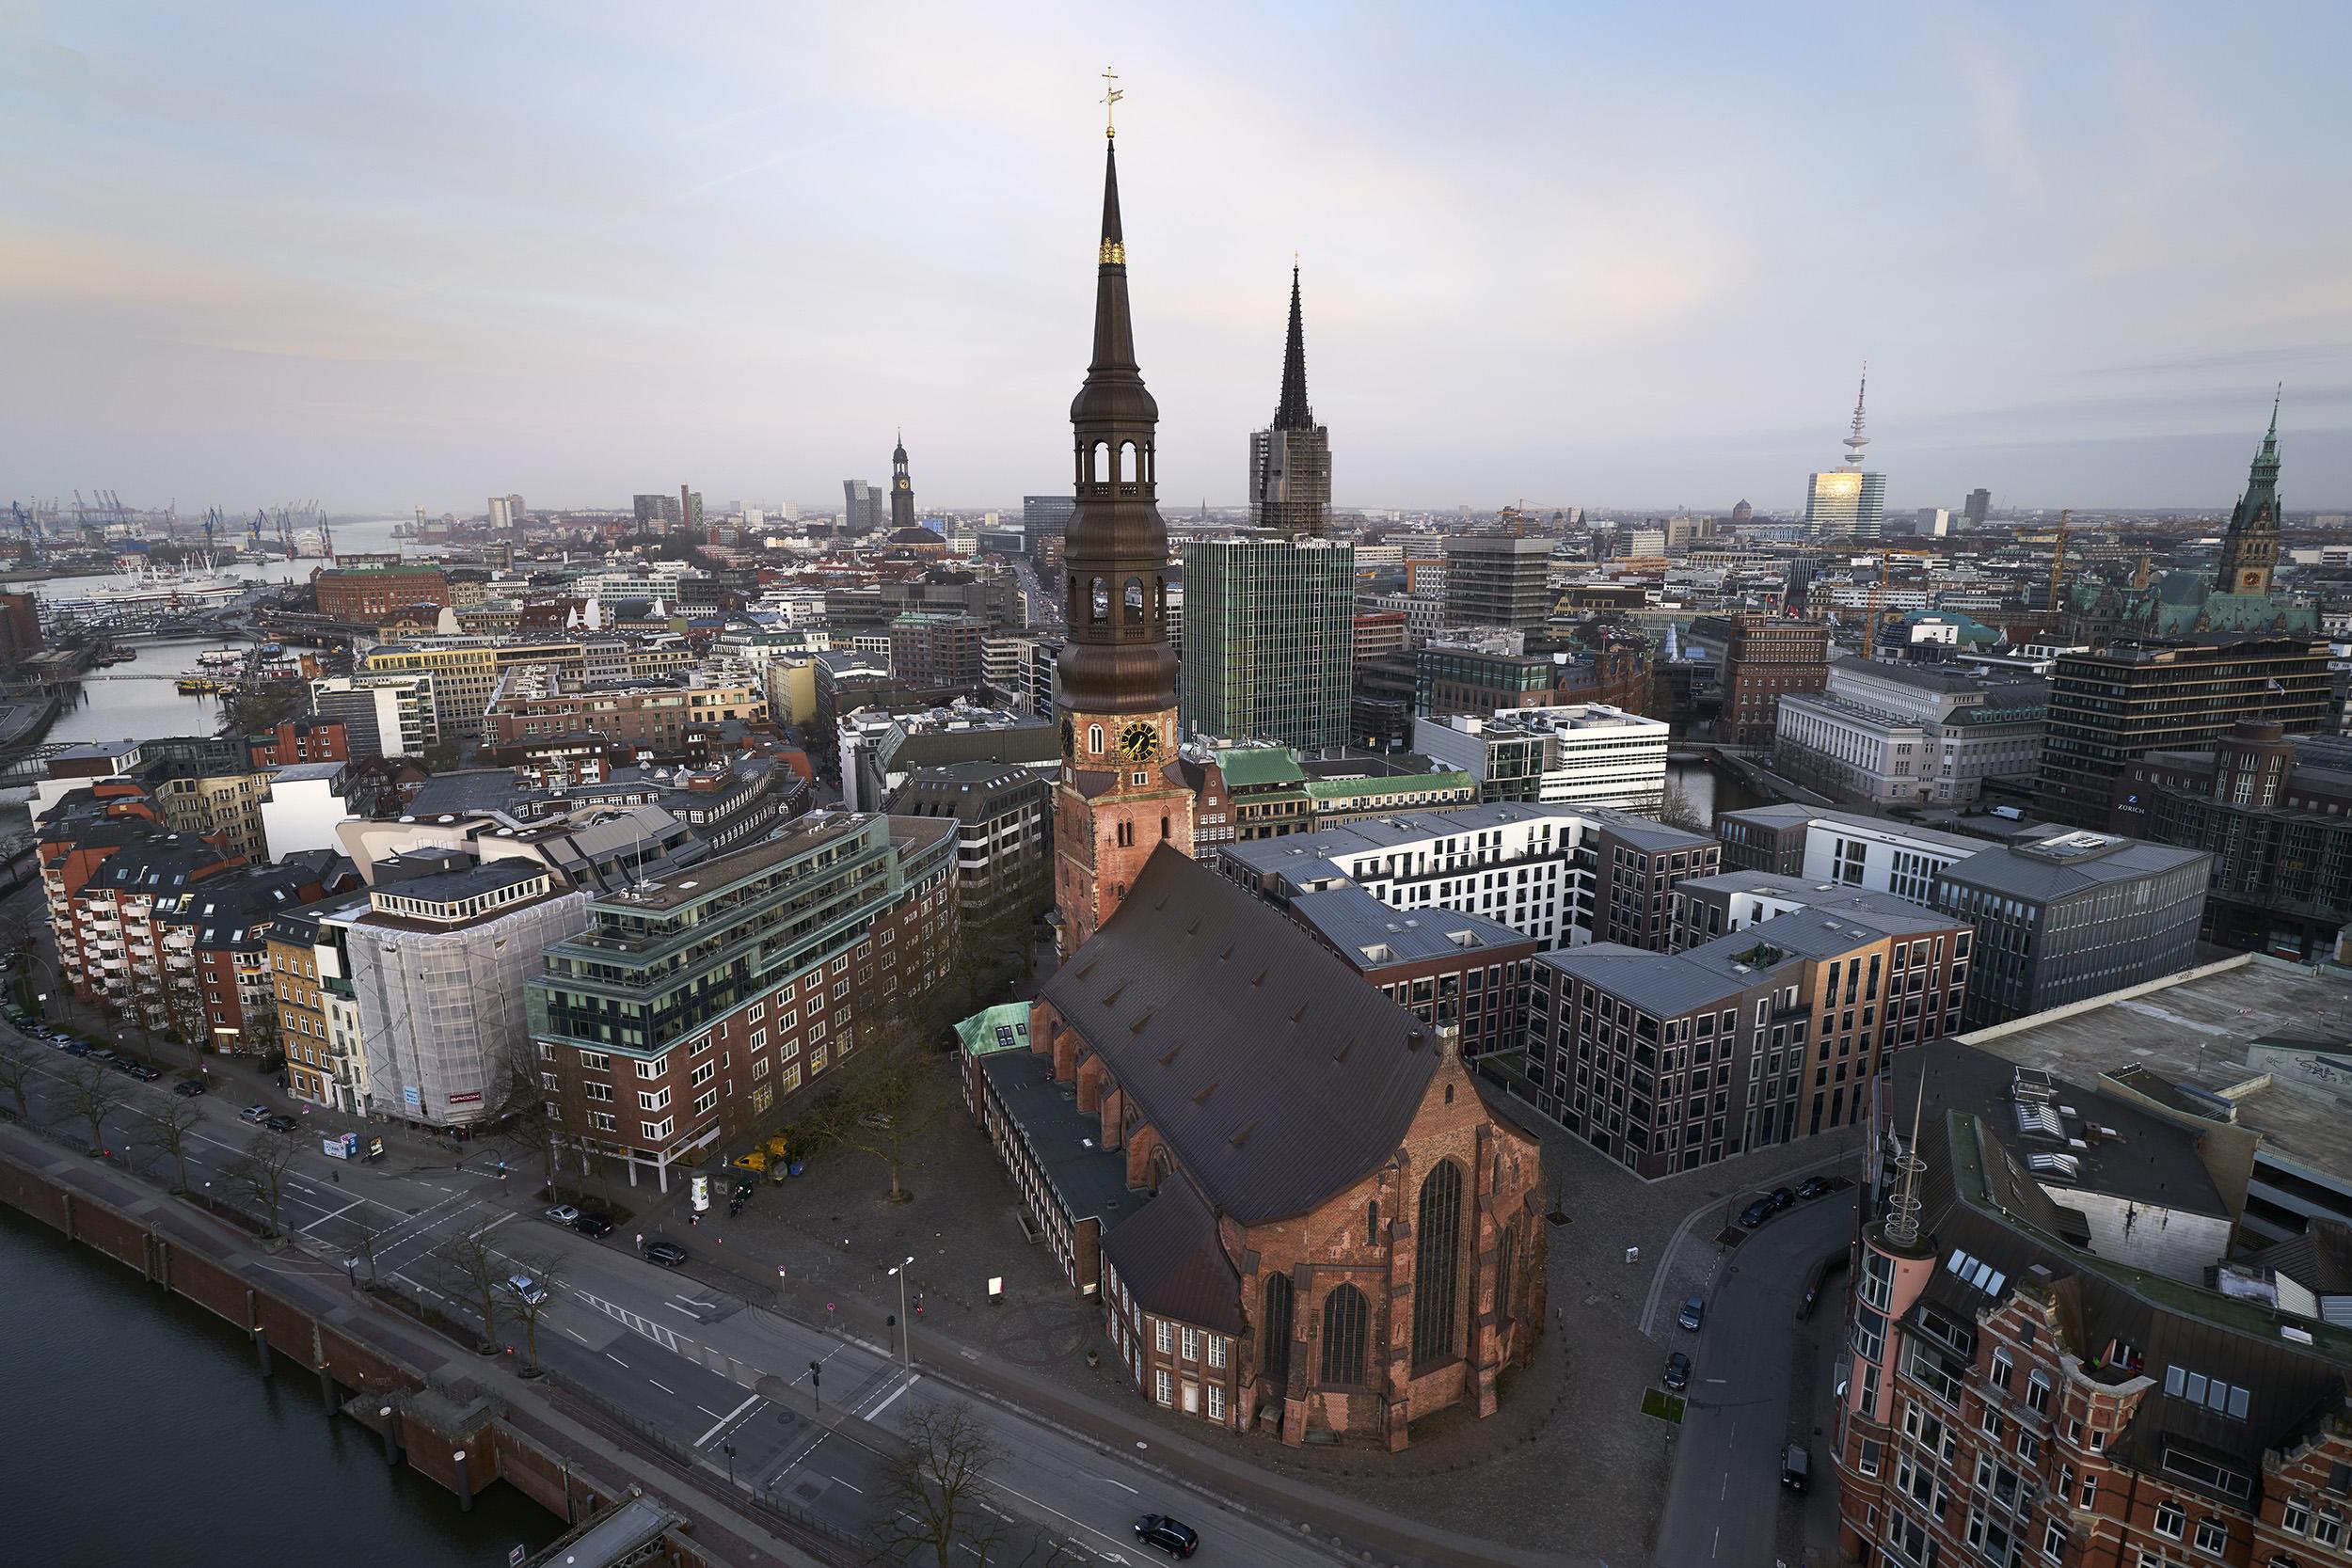 Hamburg St. Katharinen